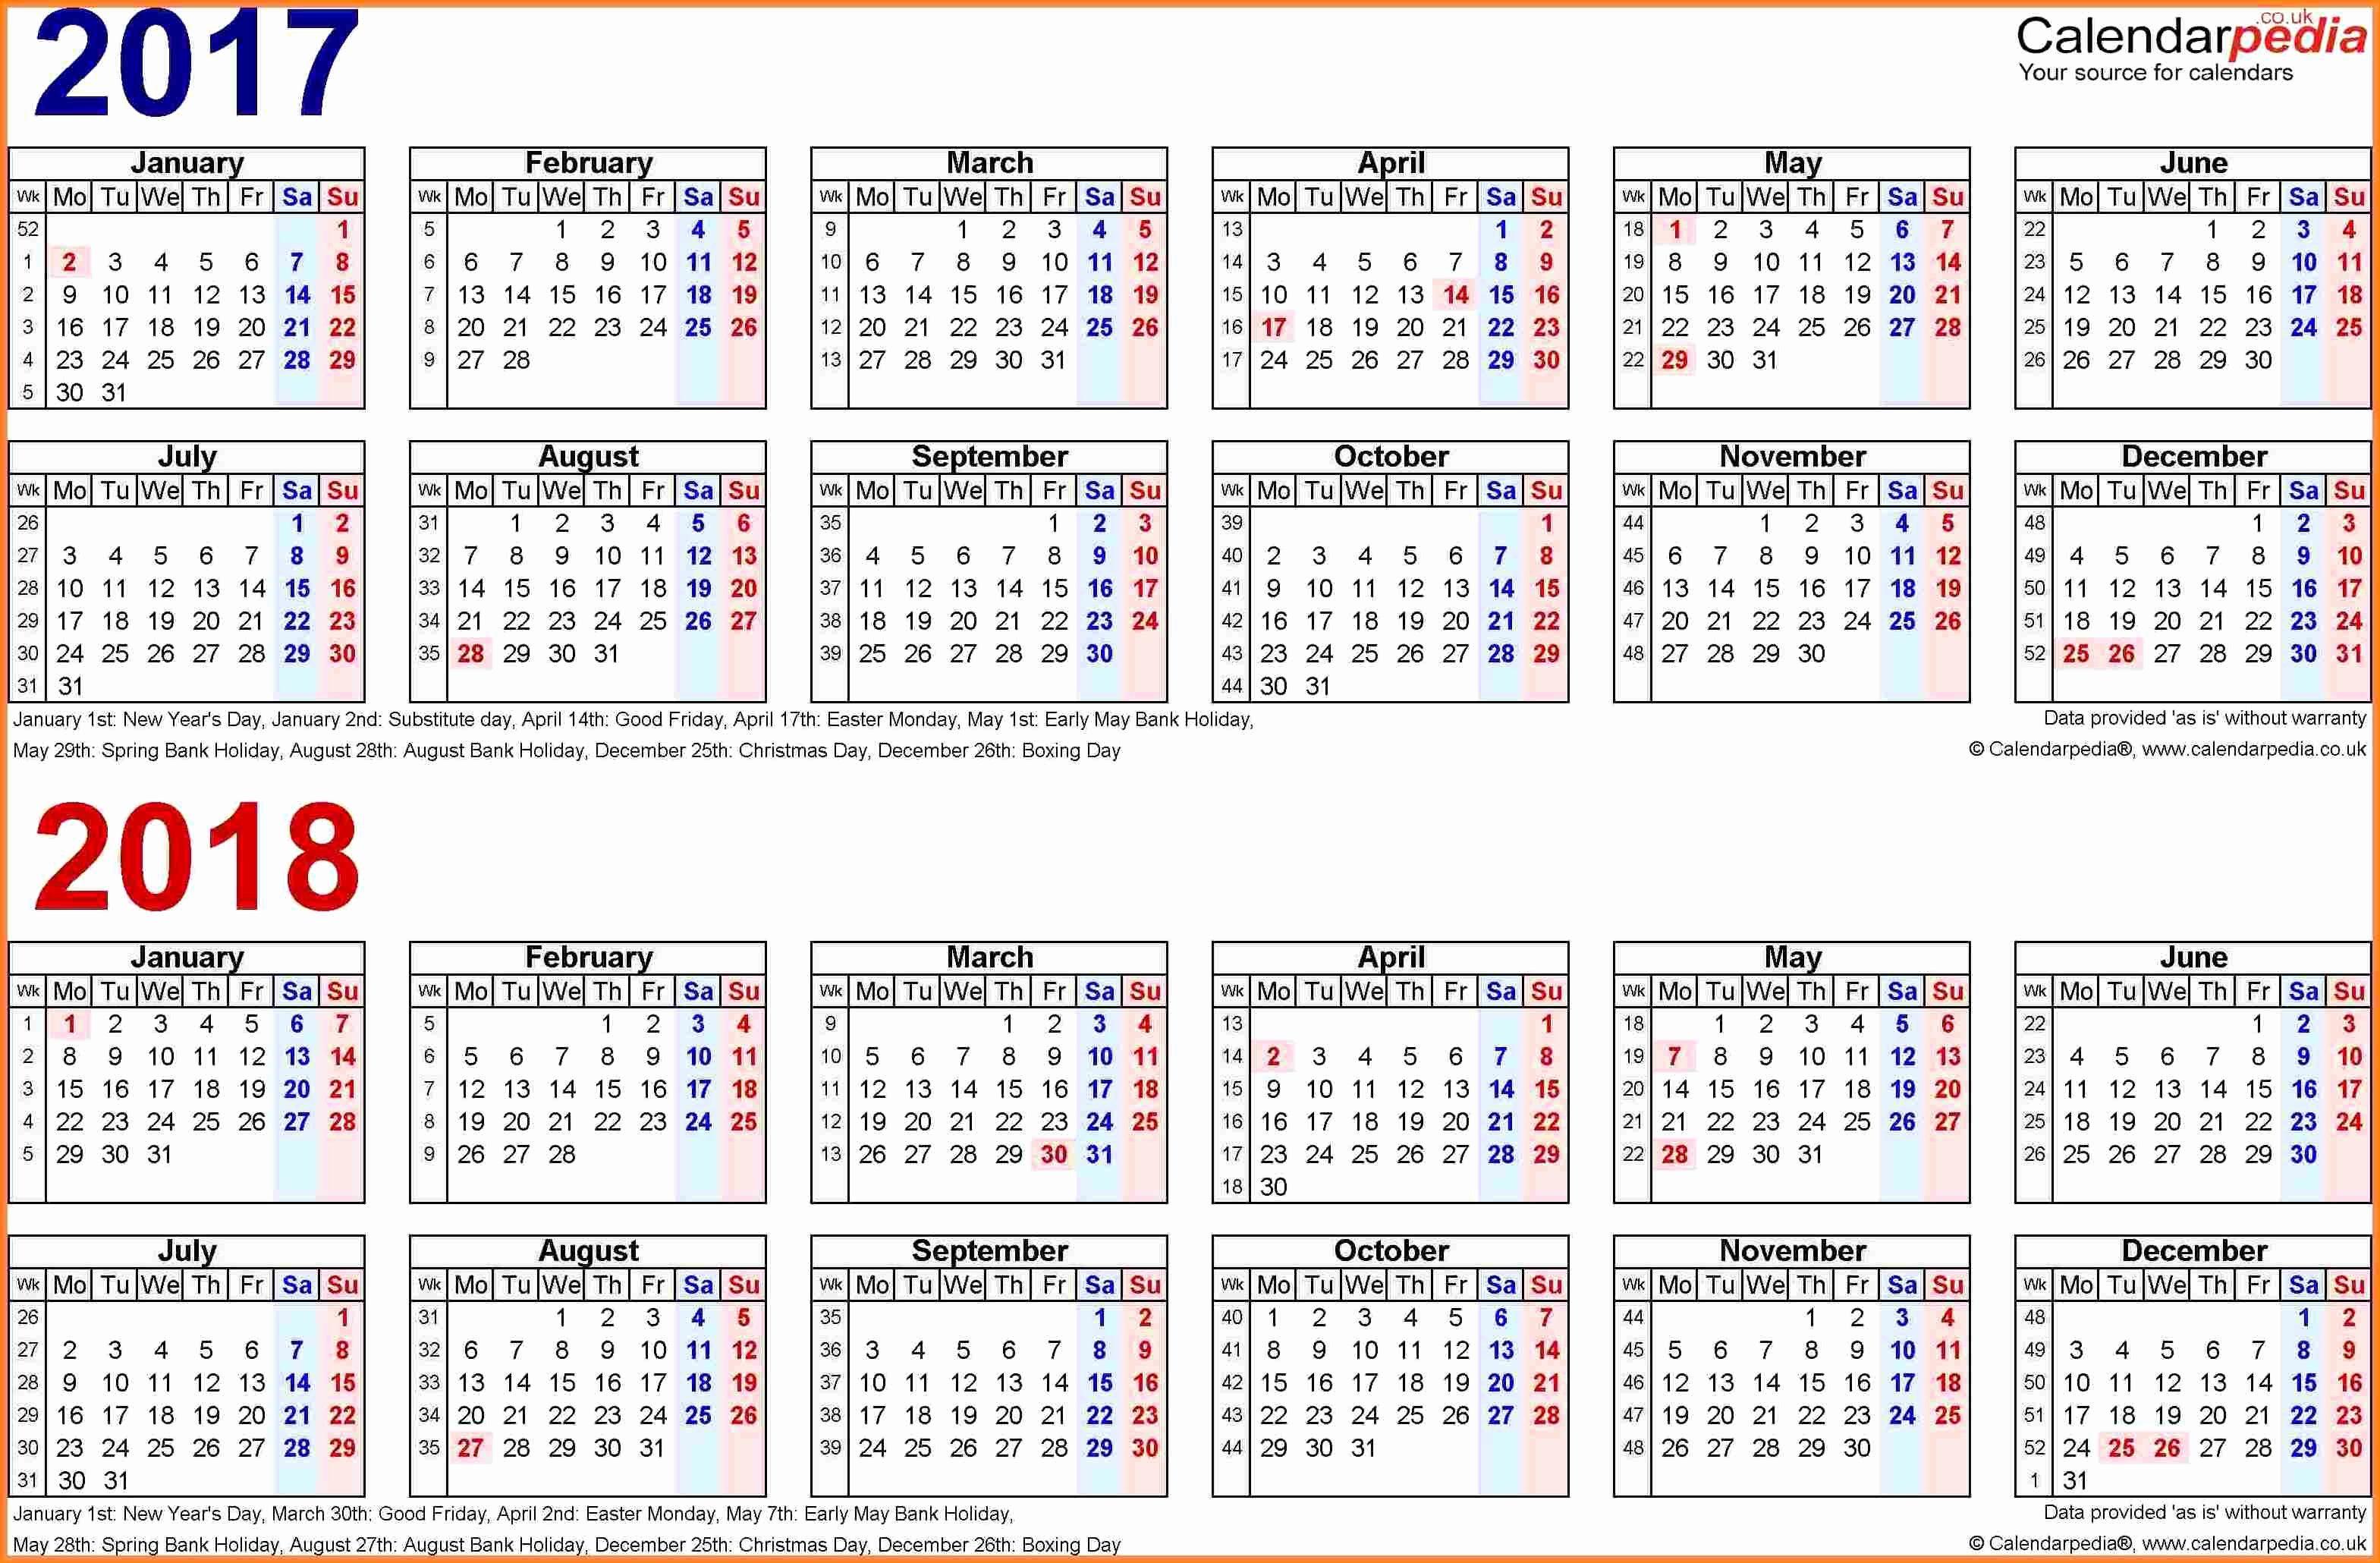 Biweekly Payroll Calendar Template 2017 Elegant Employee Payroll pertaining to Bi Weekly Calendar Template